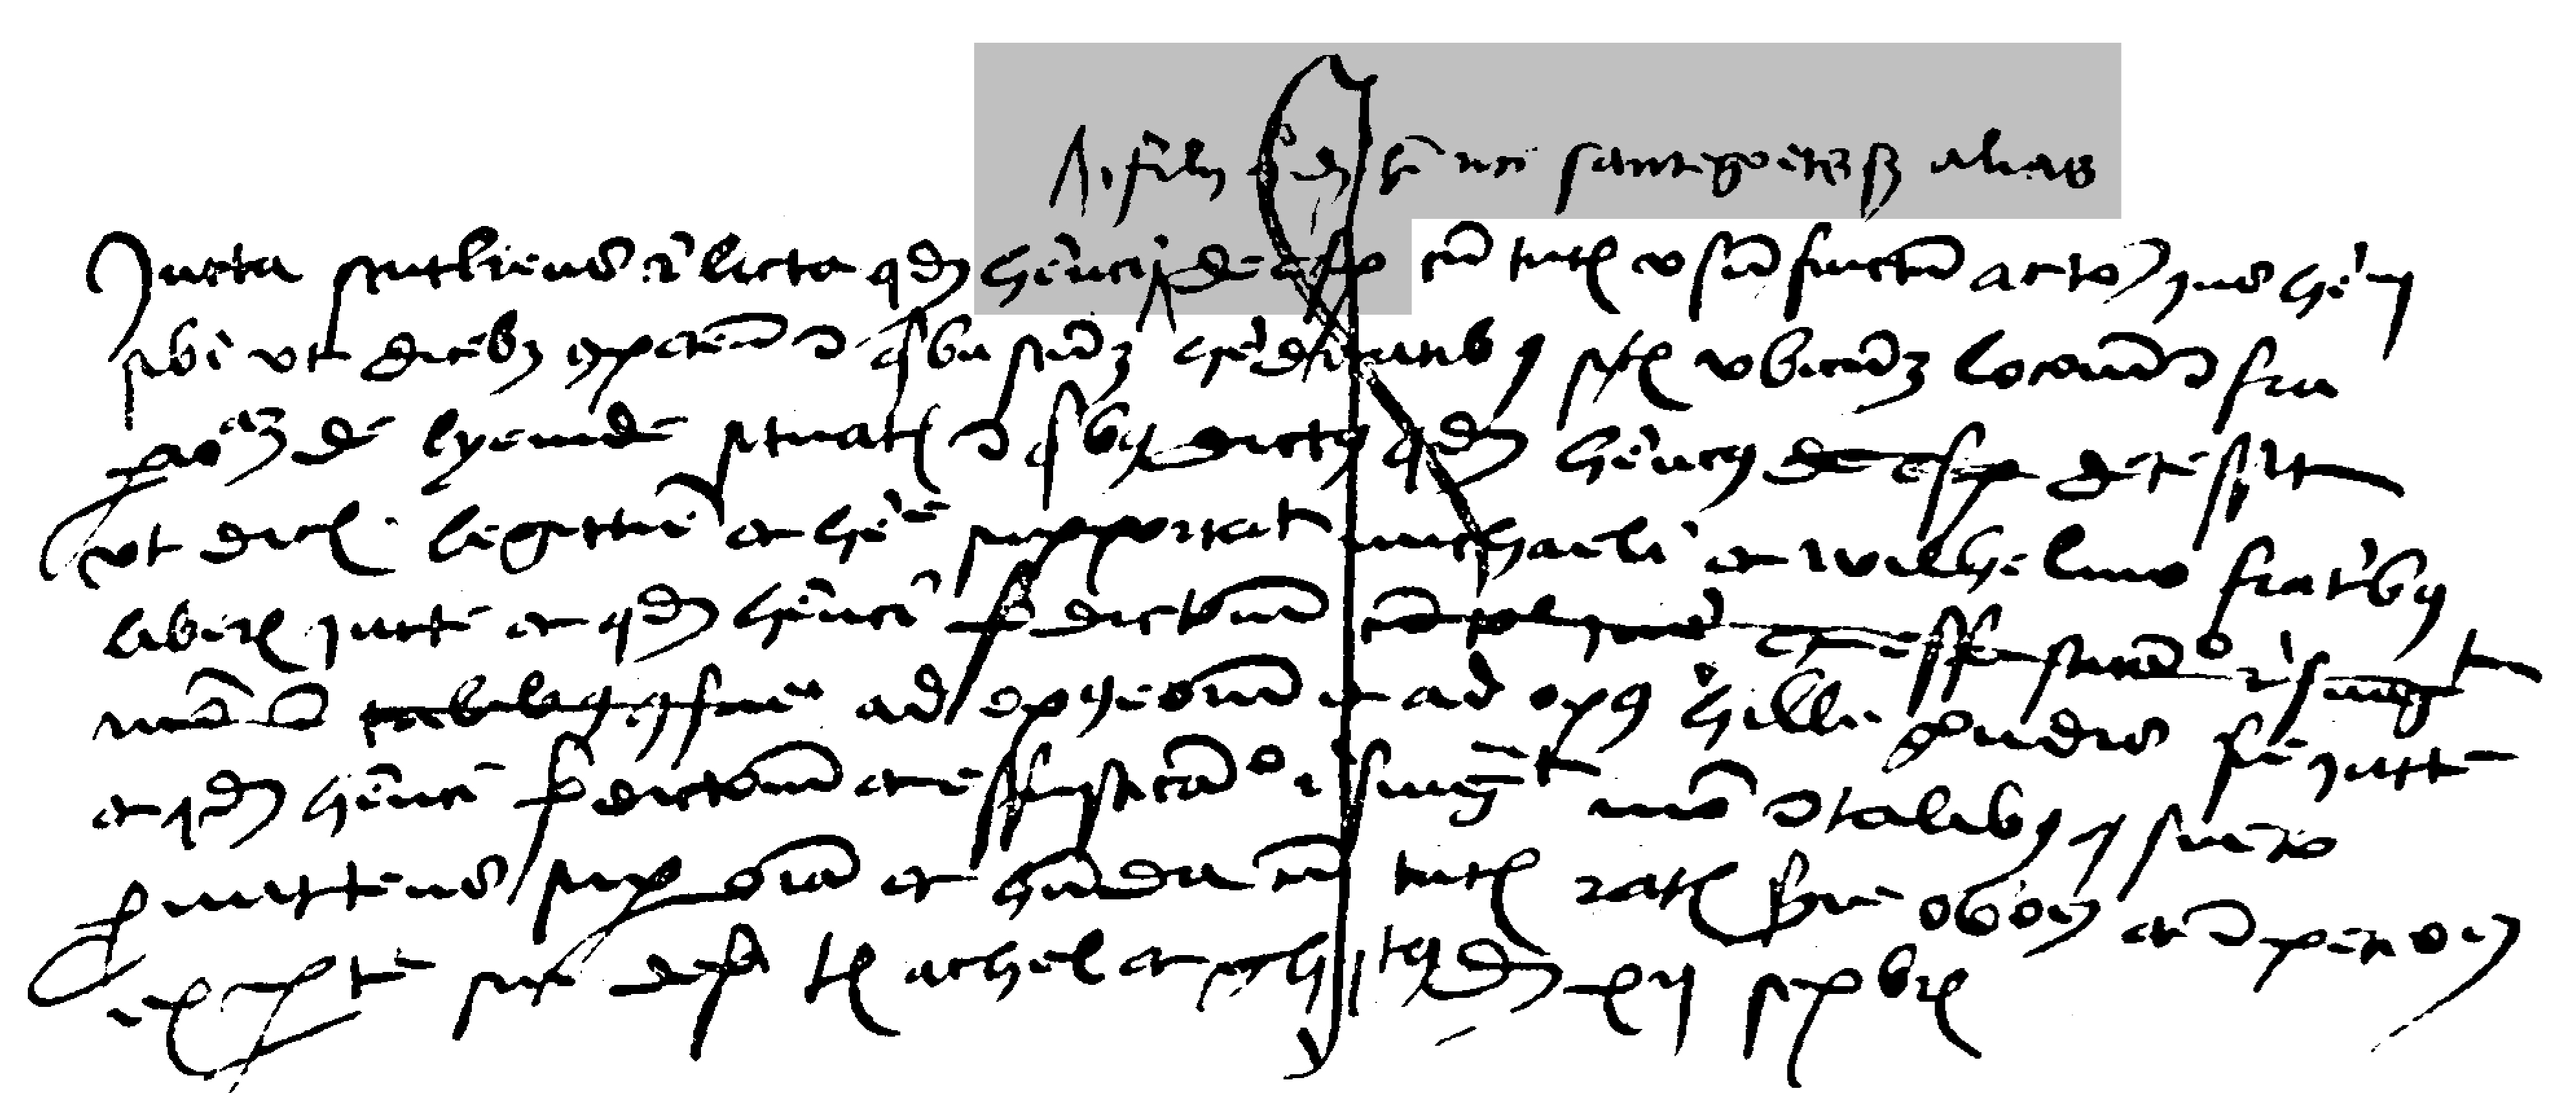 akte uit 1498